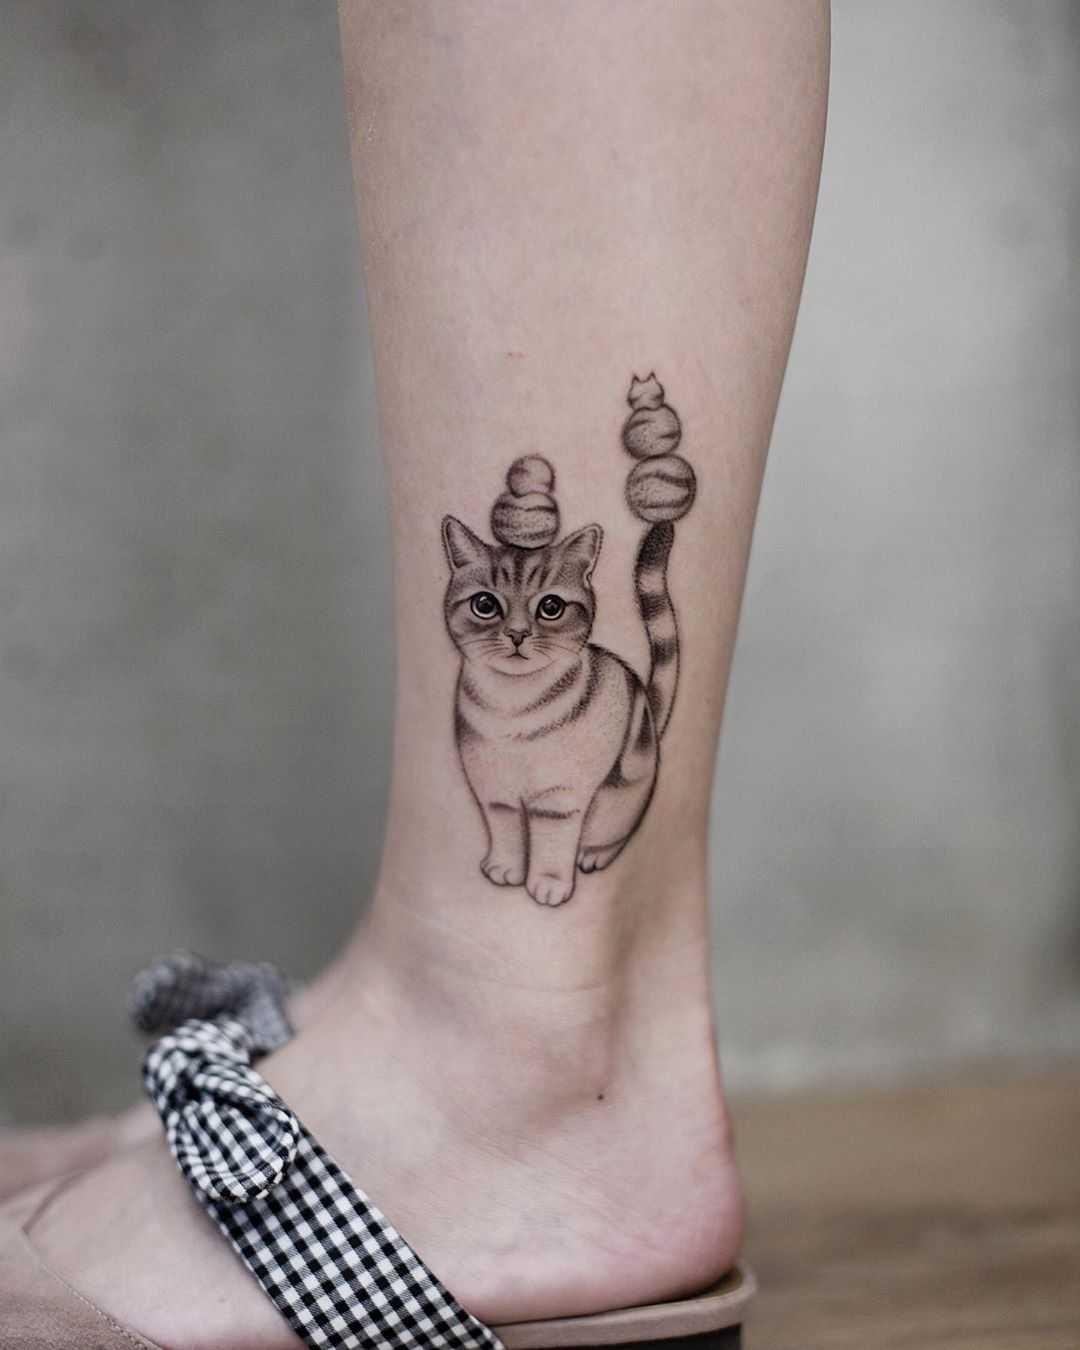 Cute cat tattoo by Aki Wong